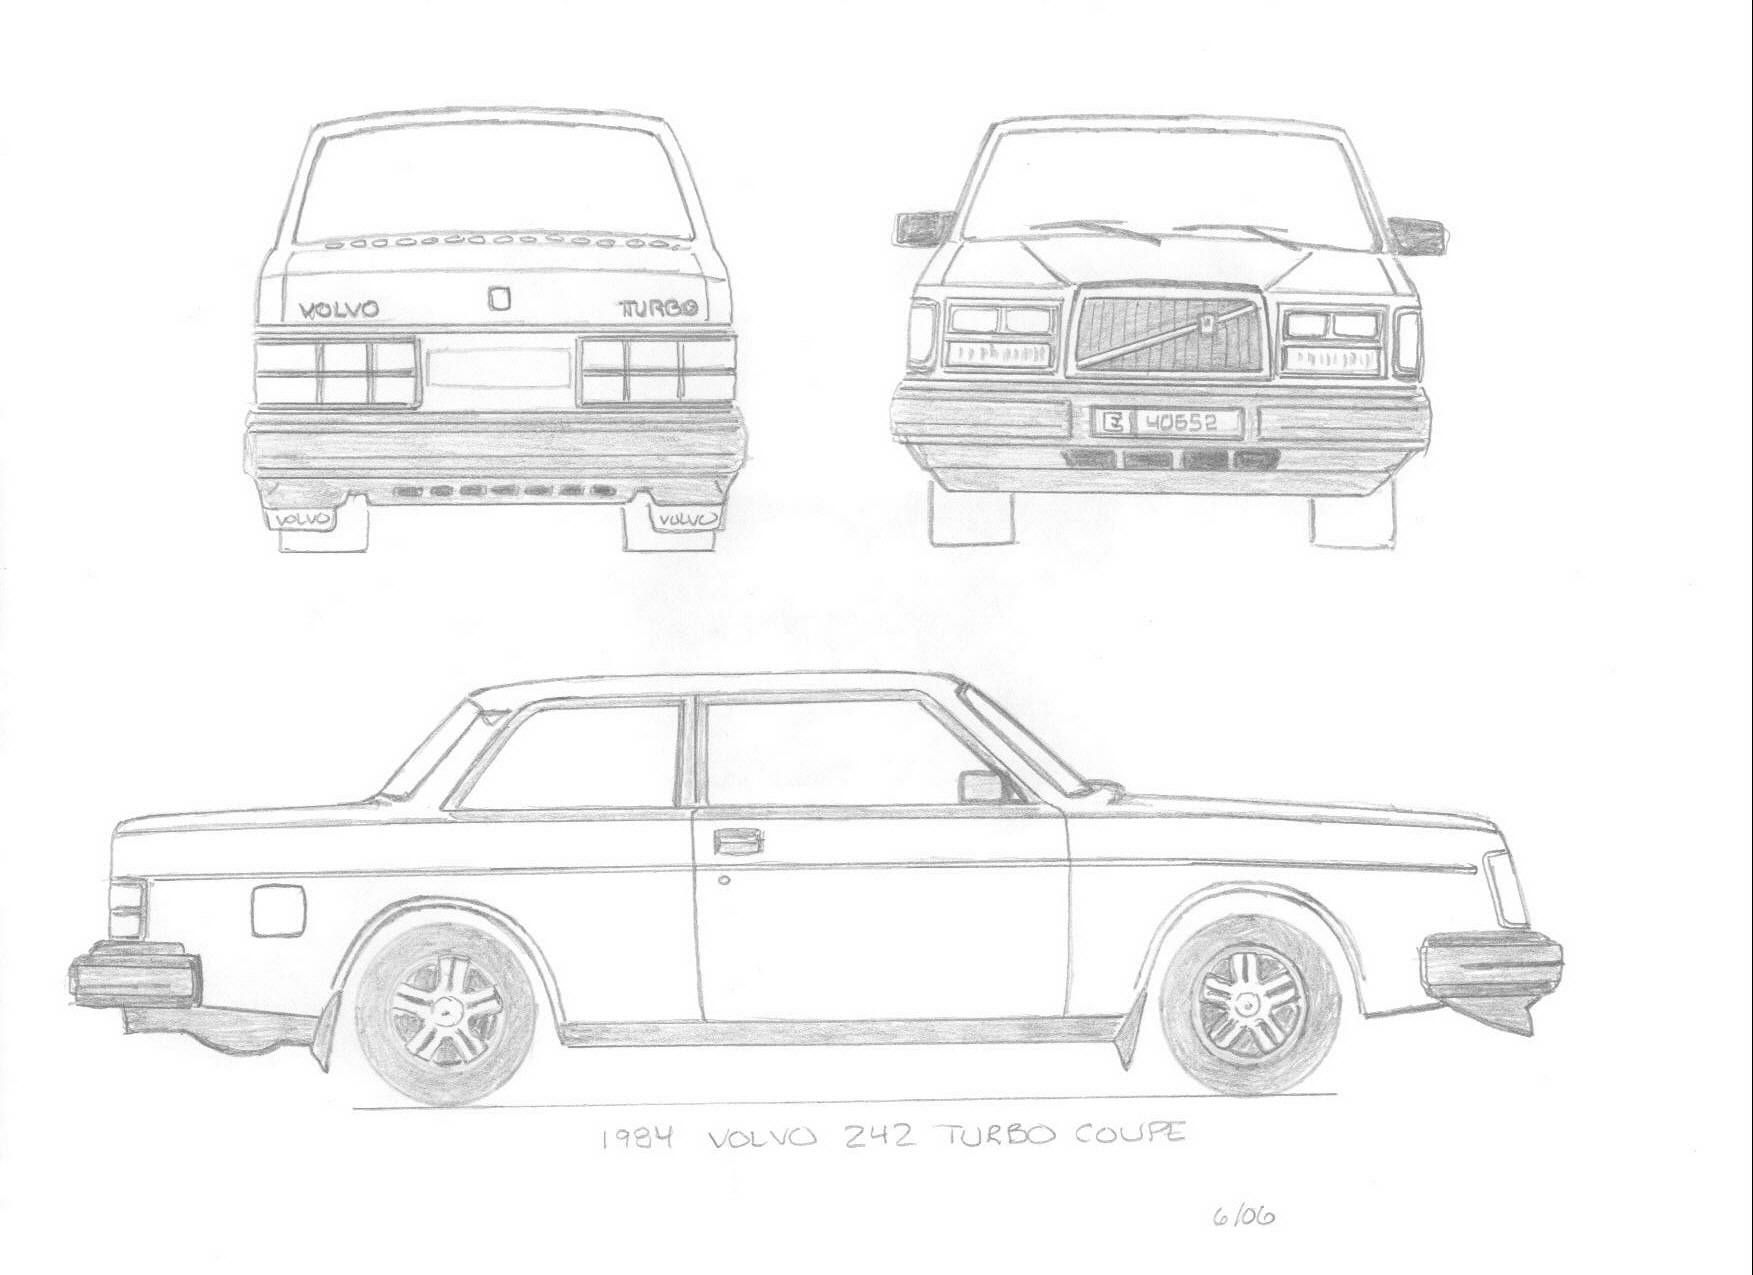 volvo 240 blueprint - Google Search   Volvos are my jam ...